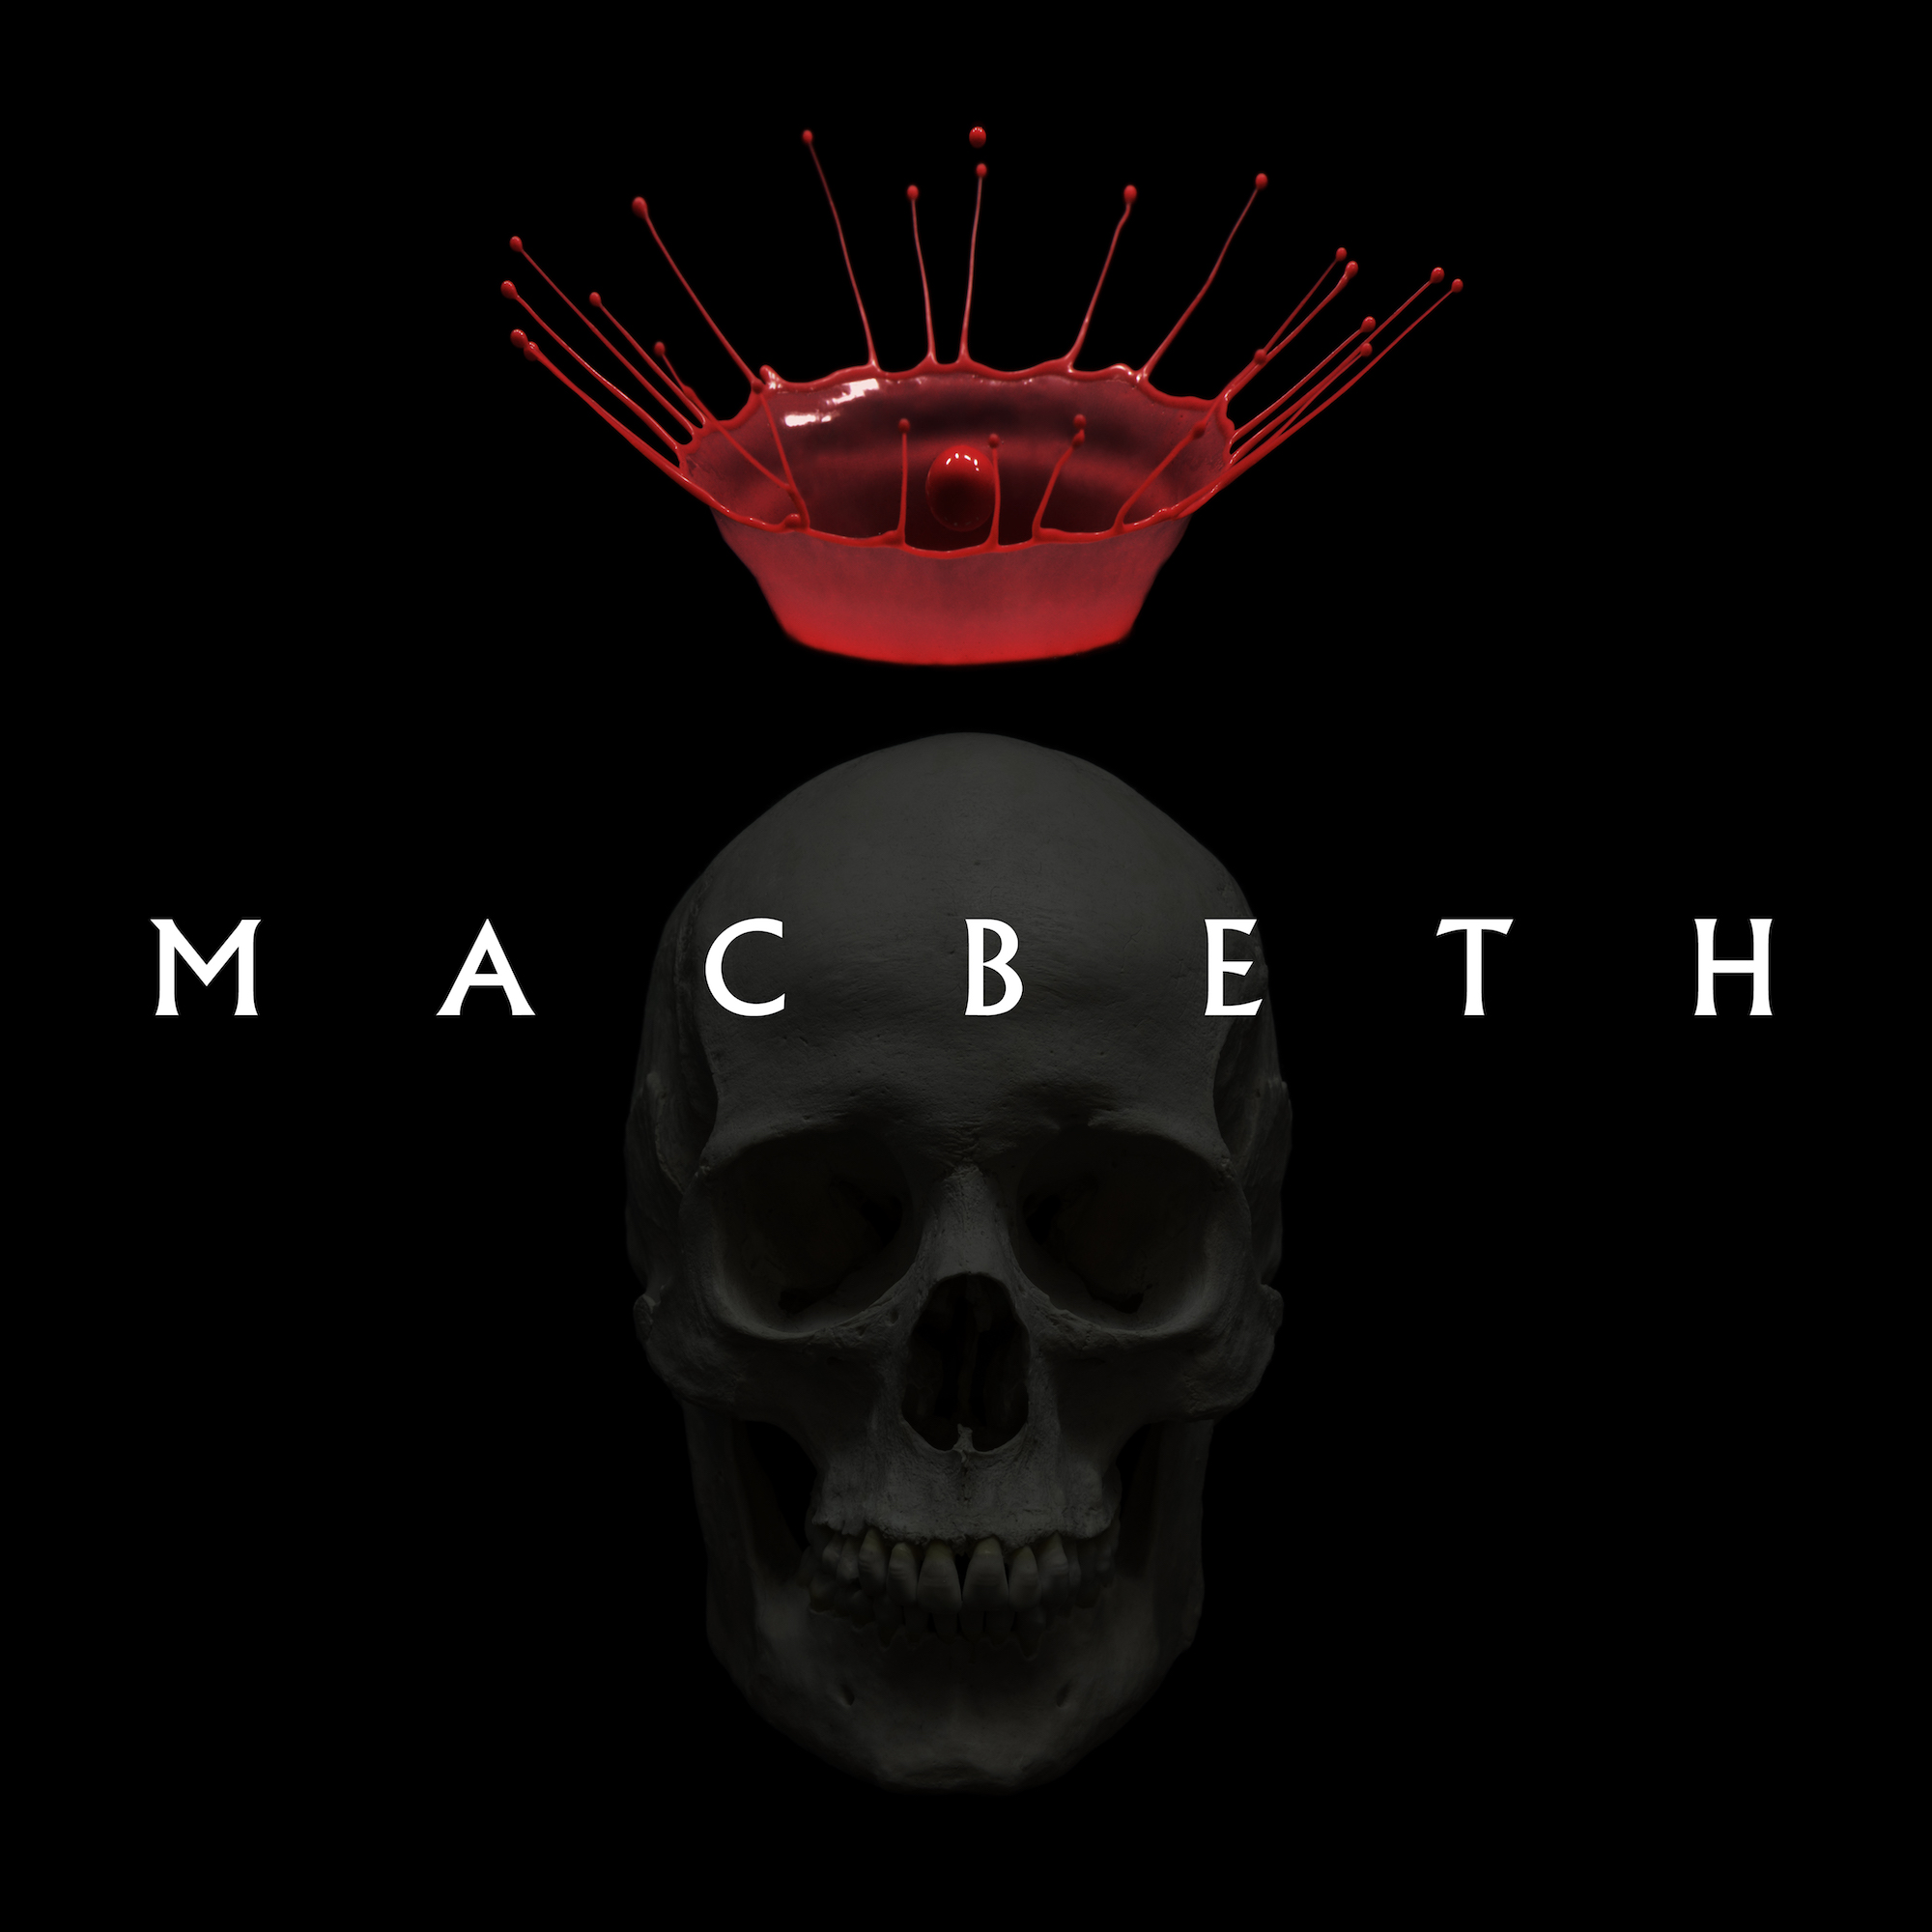 Macbeth_Key-image_Text_AW_ReducedSize.jpg